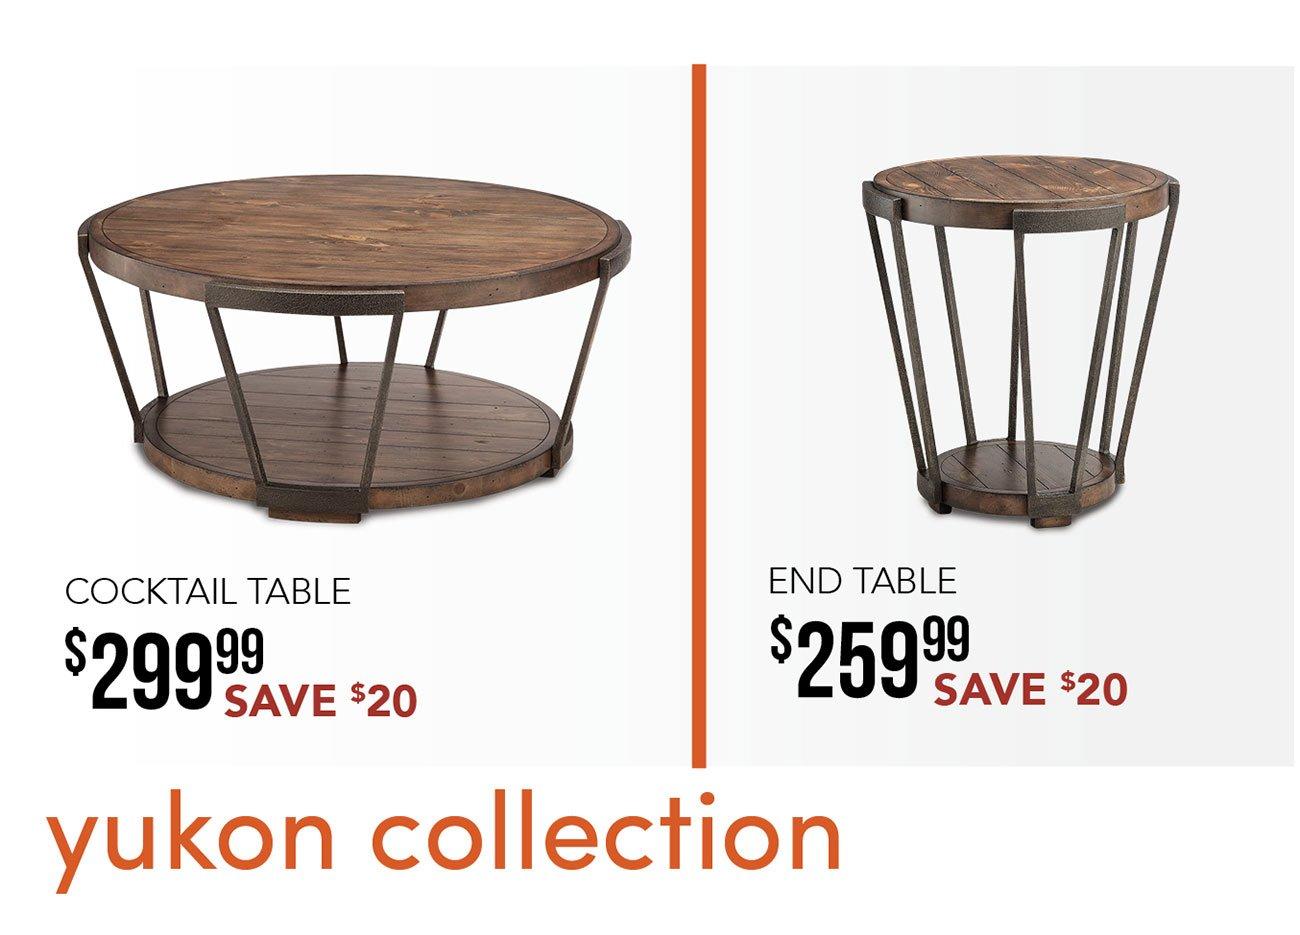 Yukon-collection